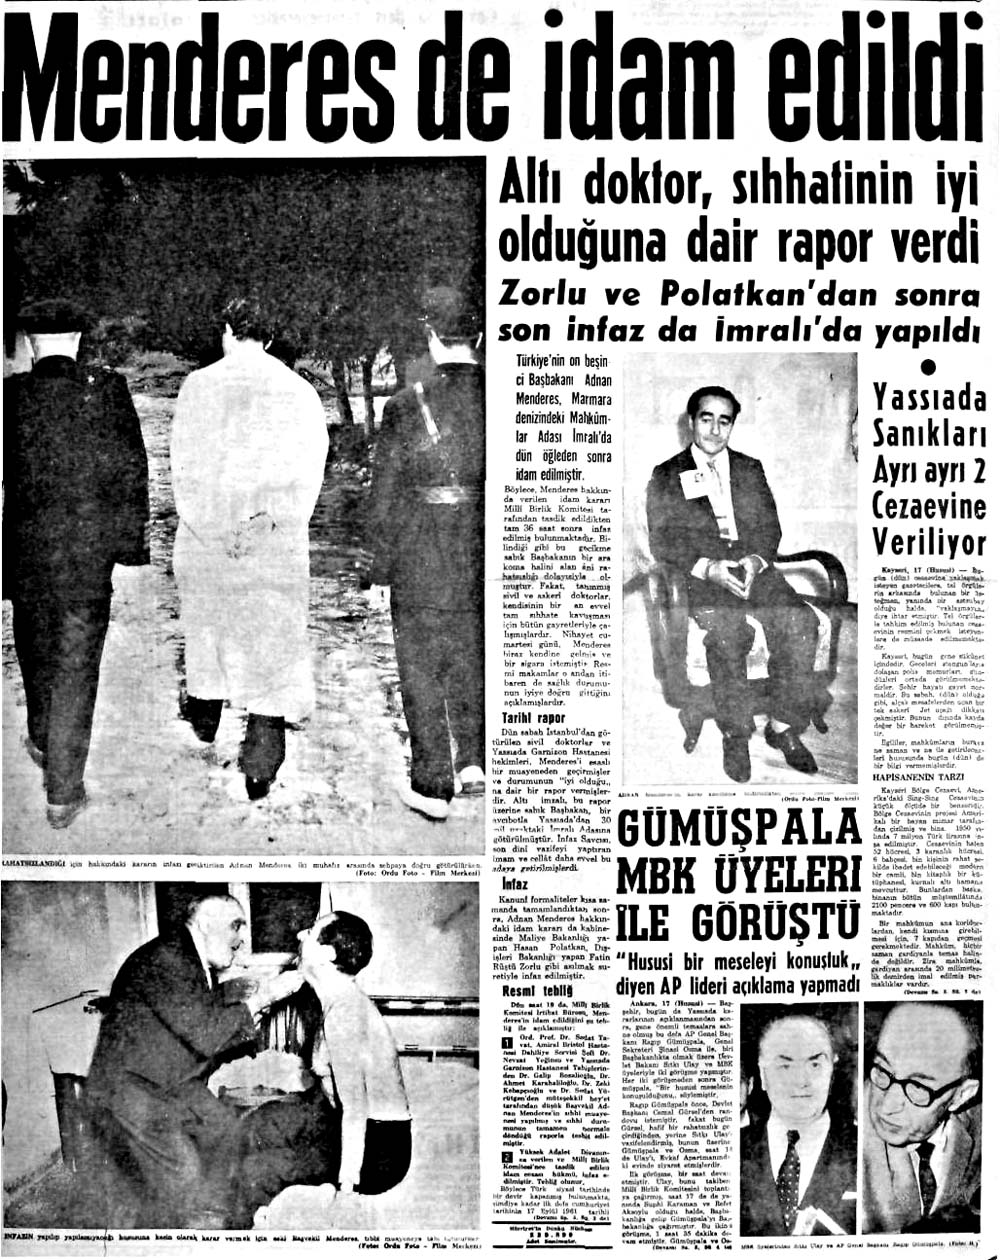 Menderes de idam edildi